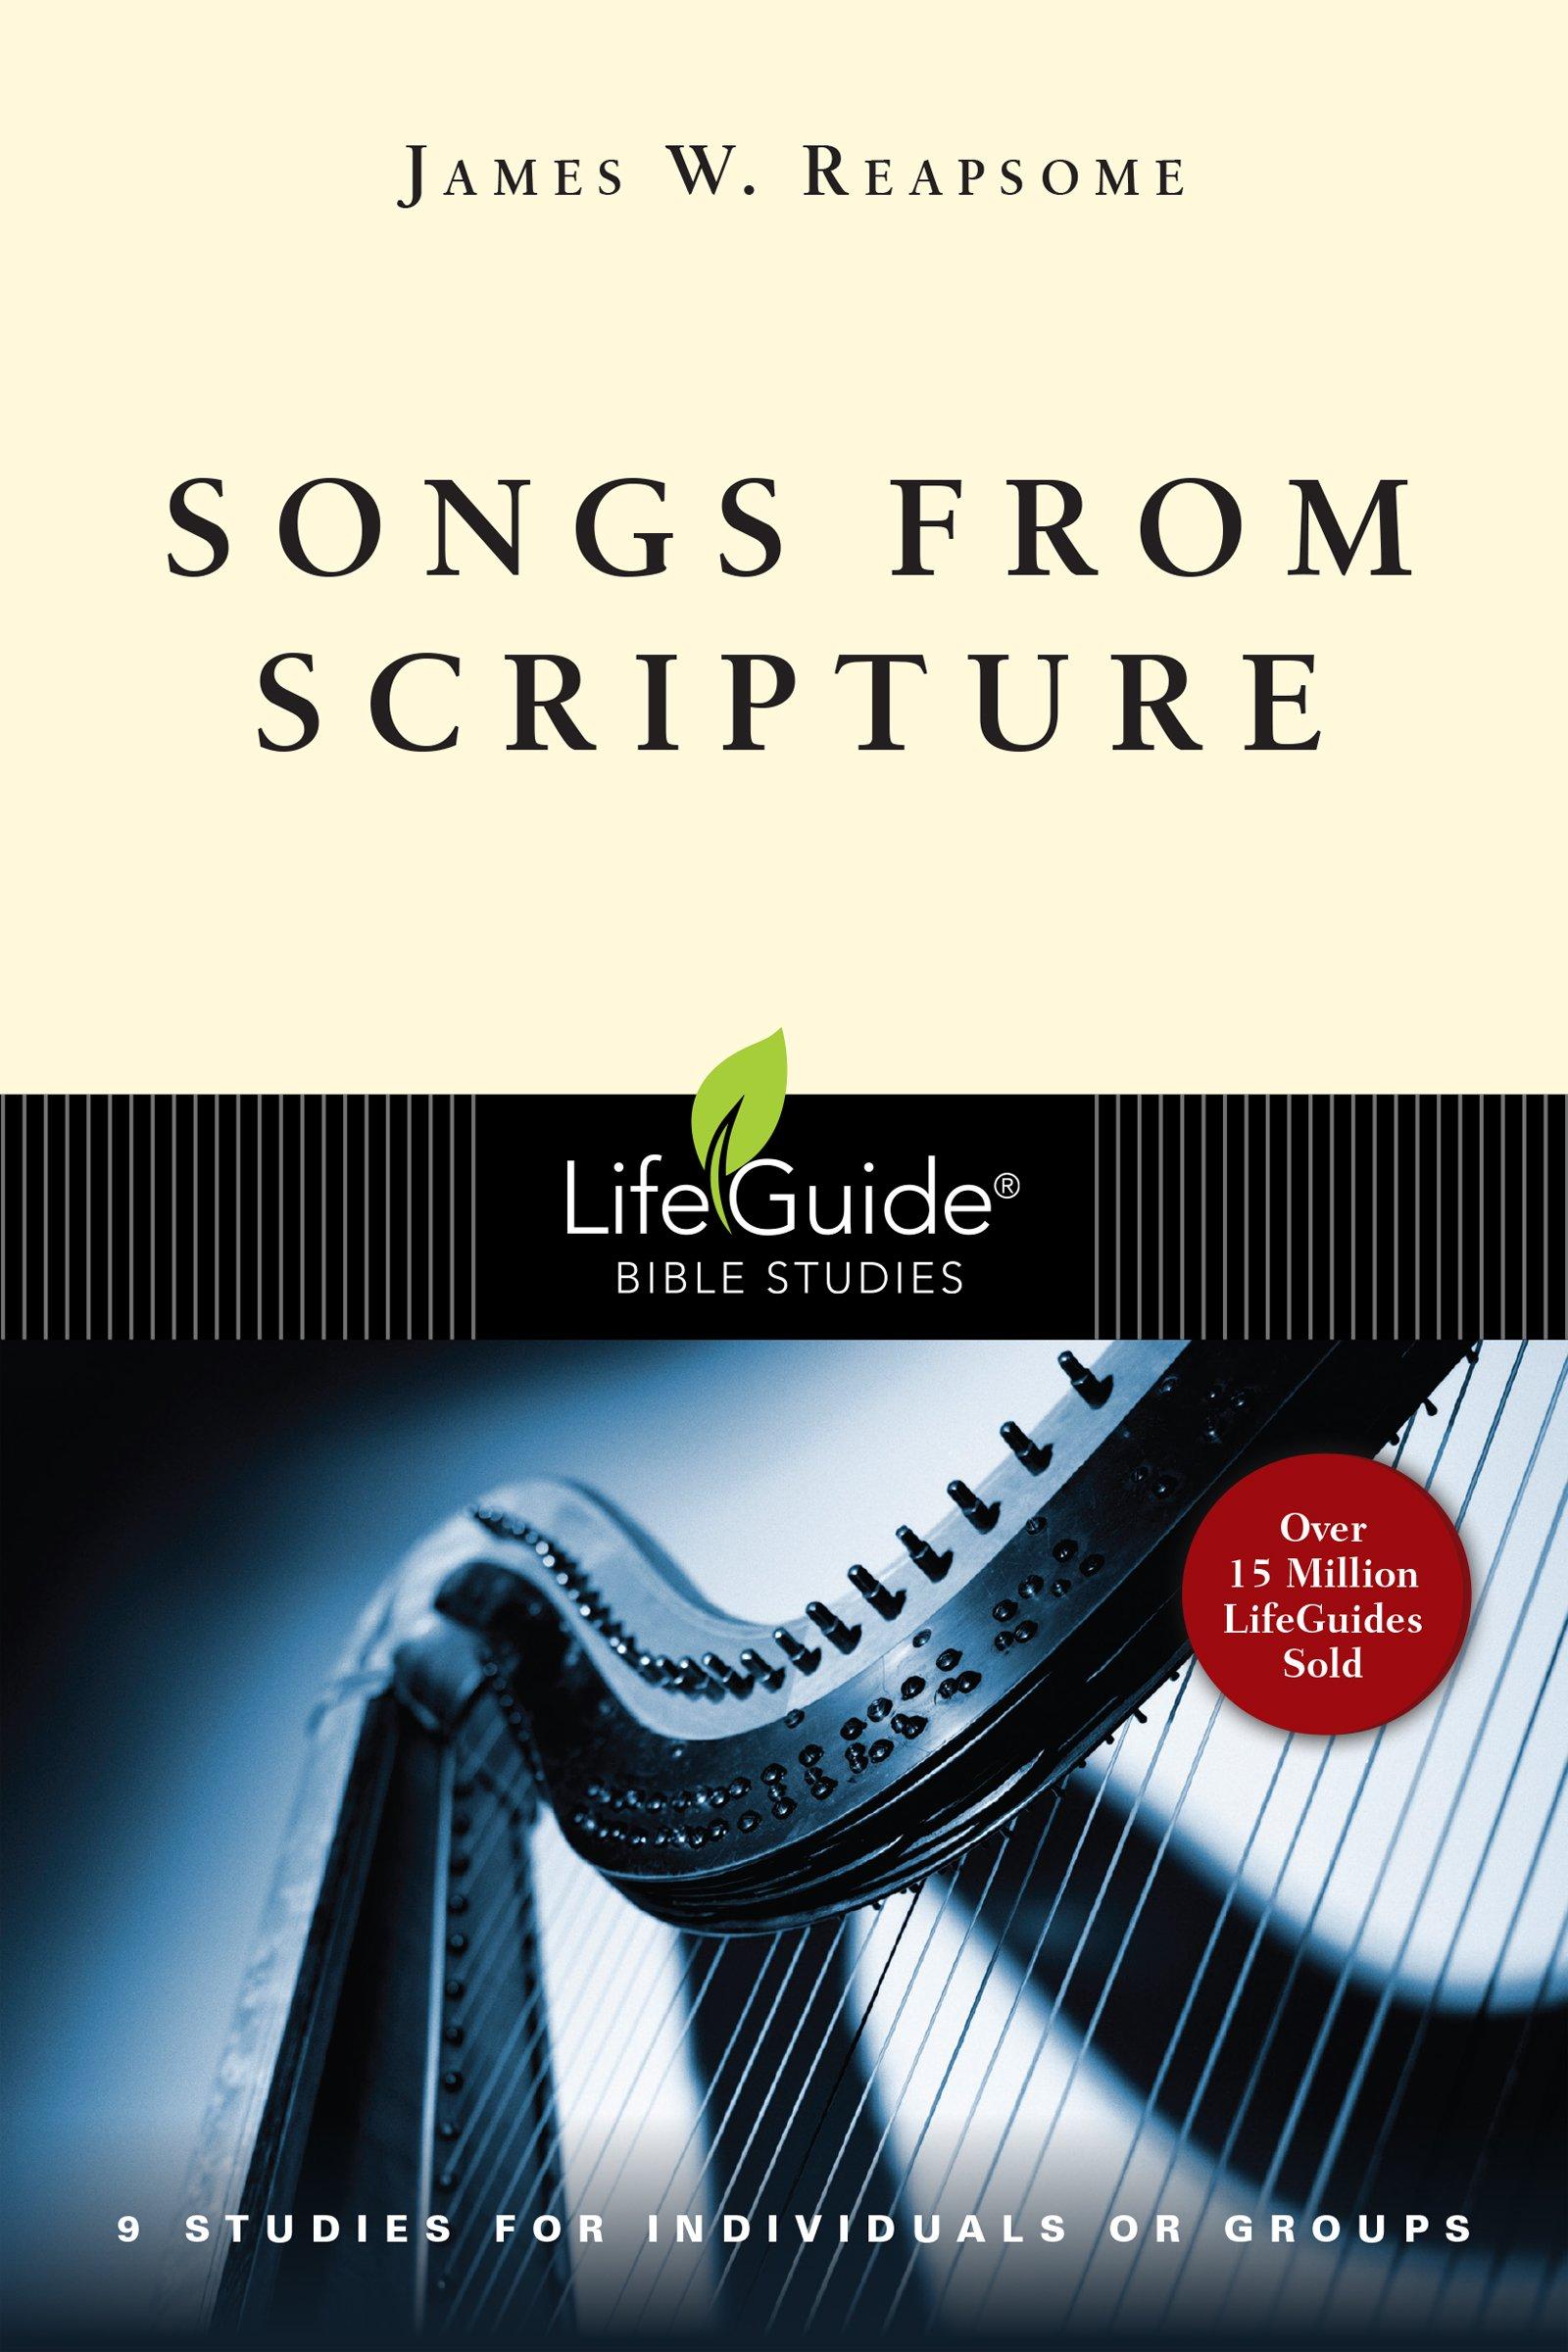 Songs from Scripture (Lifeguide Bible Studies) ebook